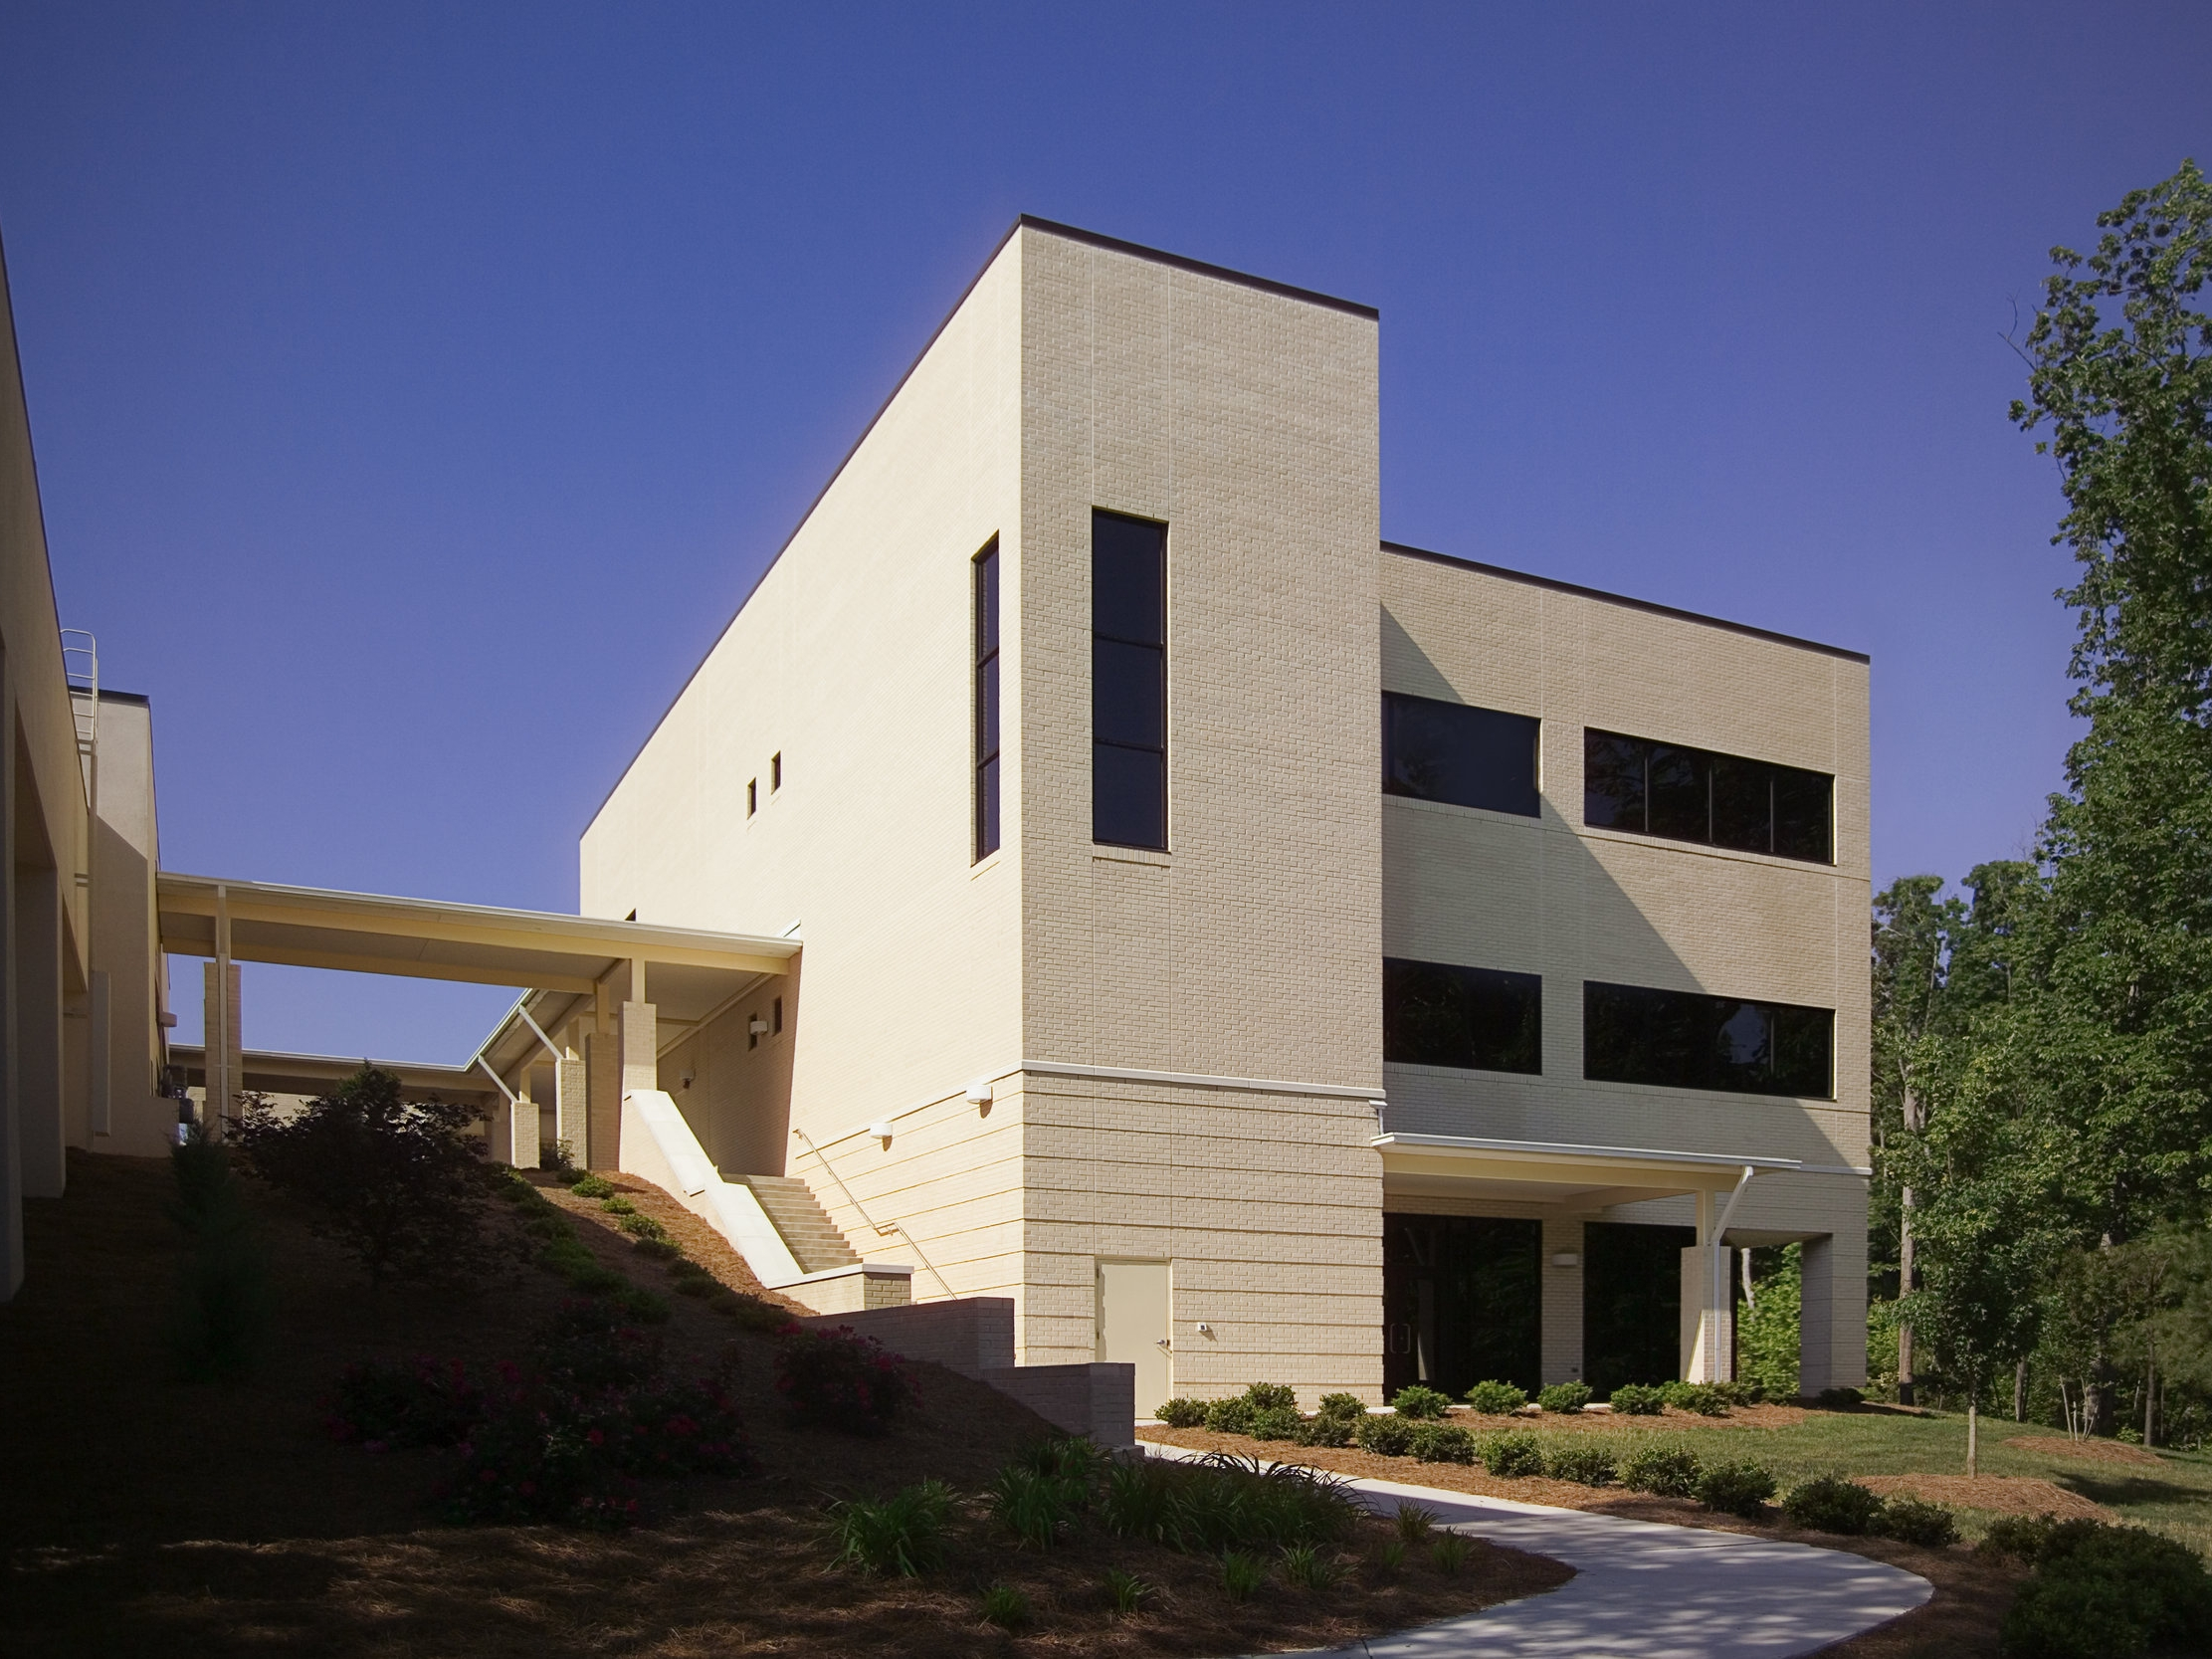 sas-gx Exterior 3 floor-3863-2.jpg